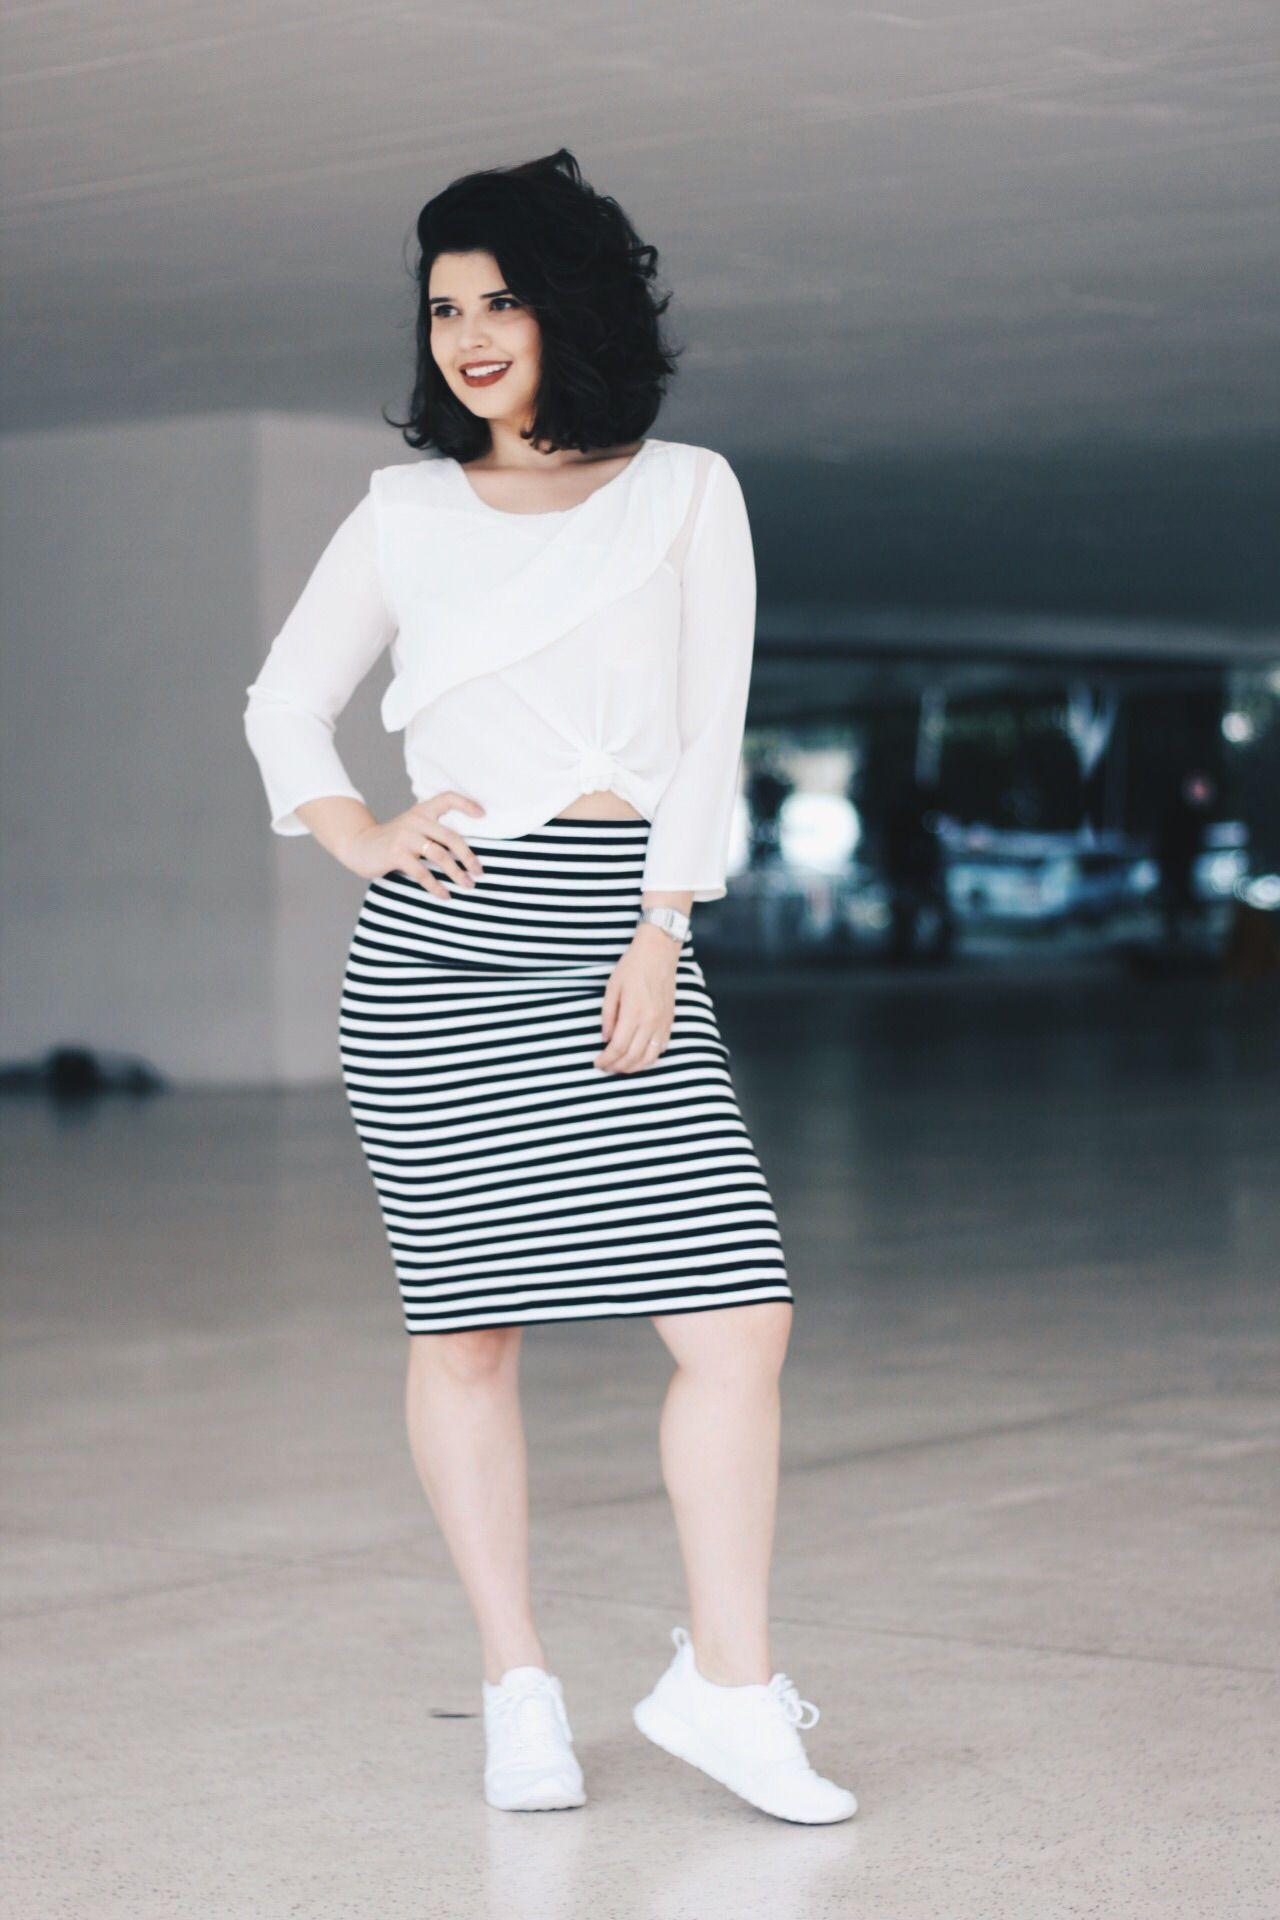 Look Dafiti Clothes Pinterest Fashion Style And Minimal Carter Pleated Shirt White Putih M Saia Lpis Listrada Mais